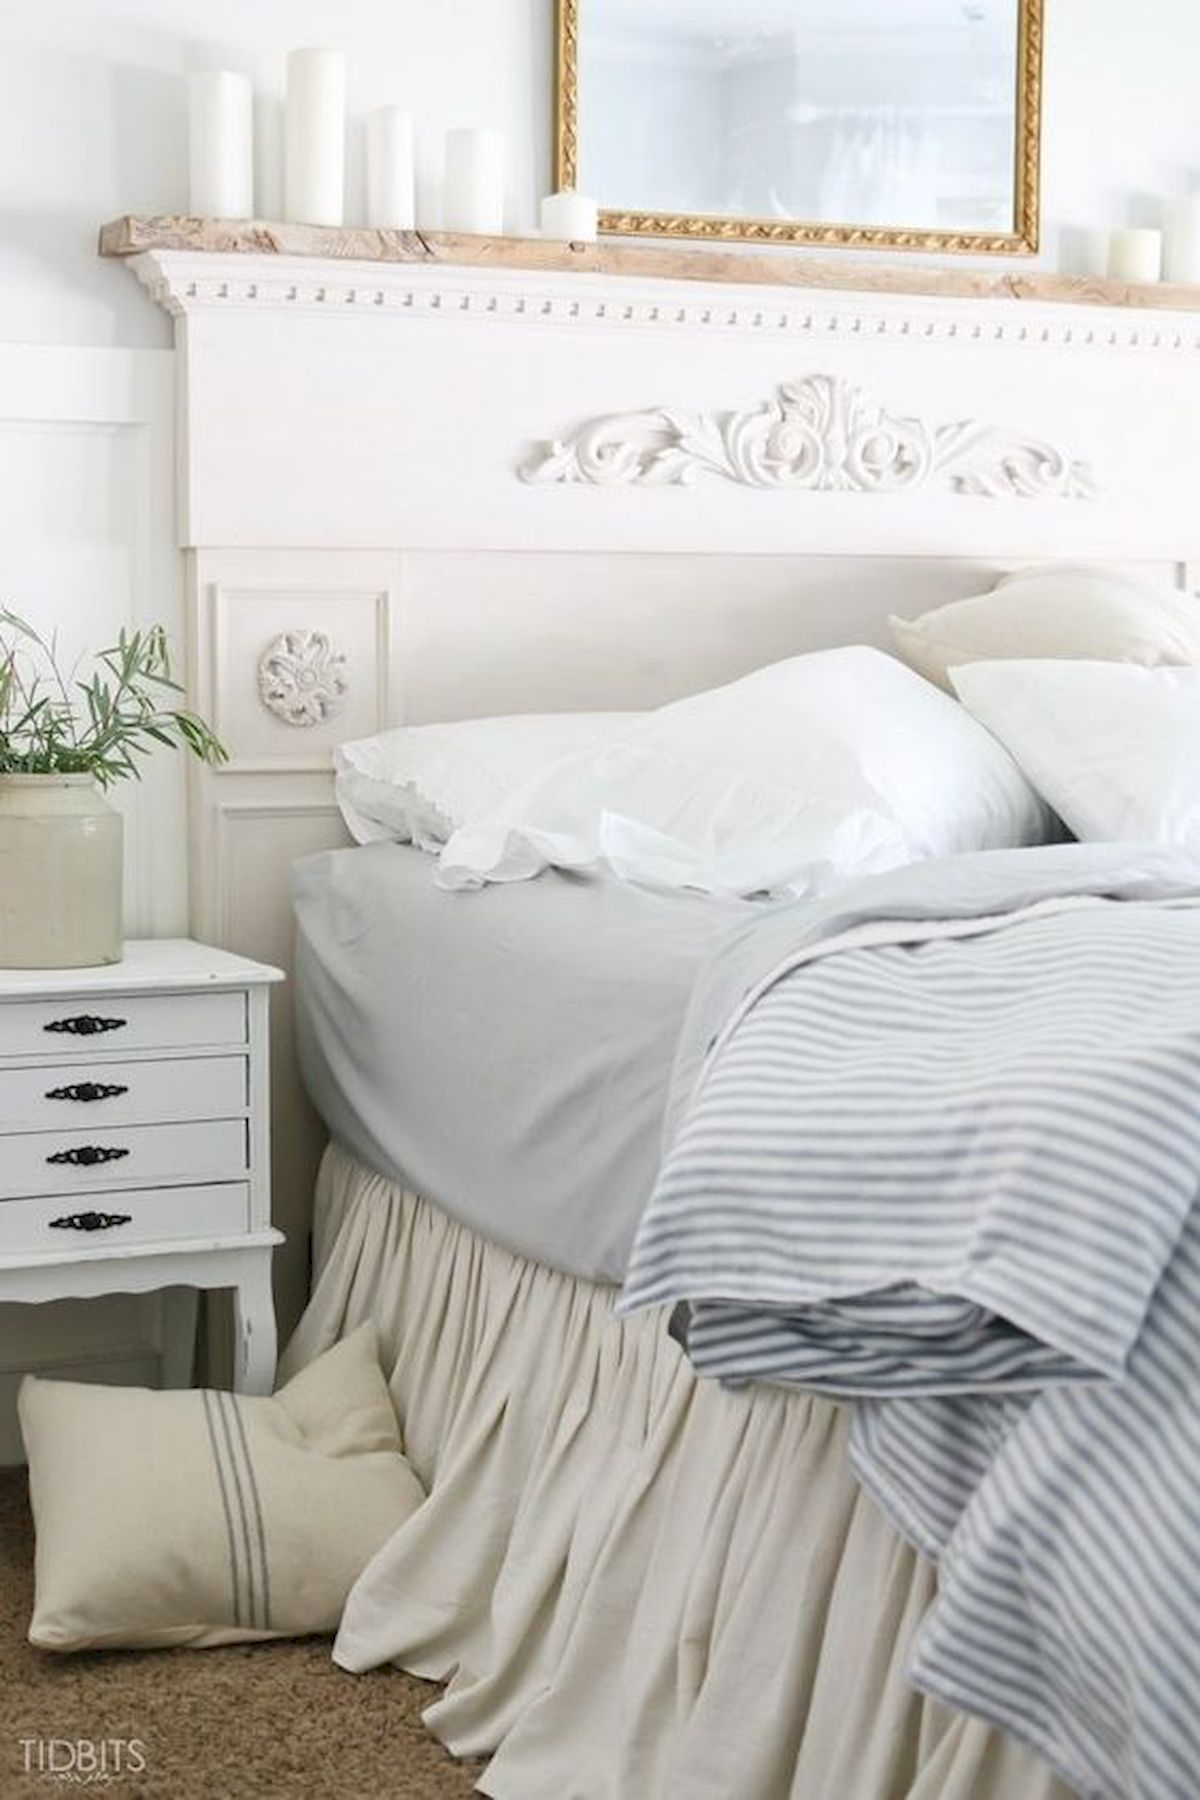 37 Simple Summer Bedroom Decor Ideas (11)